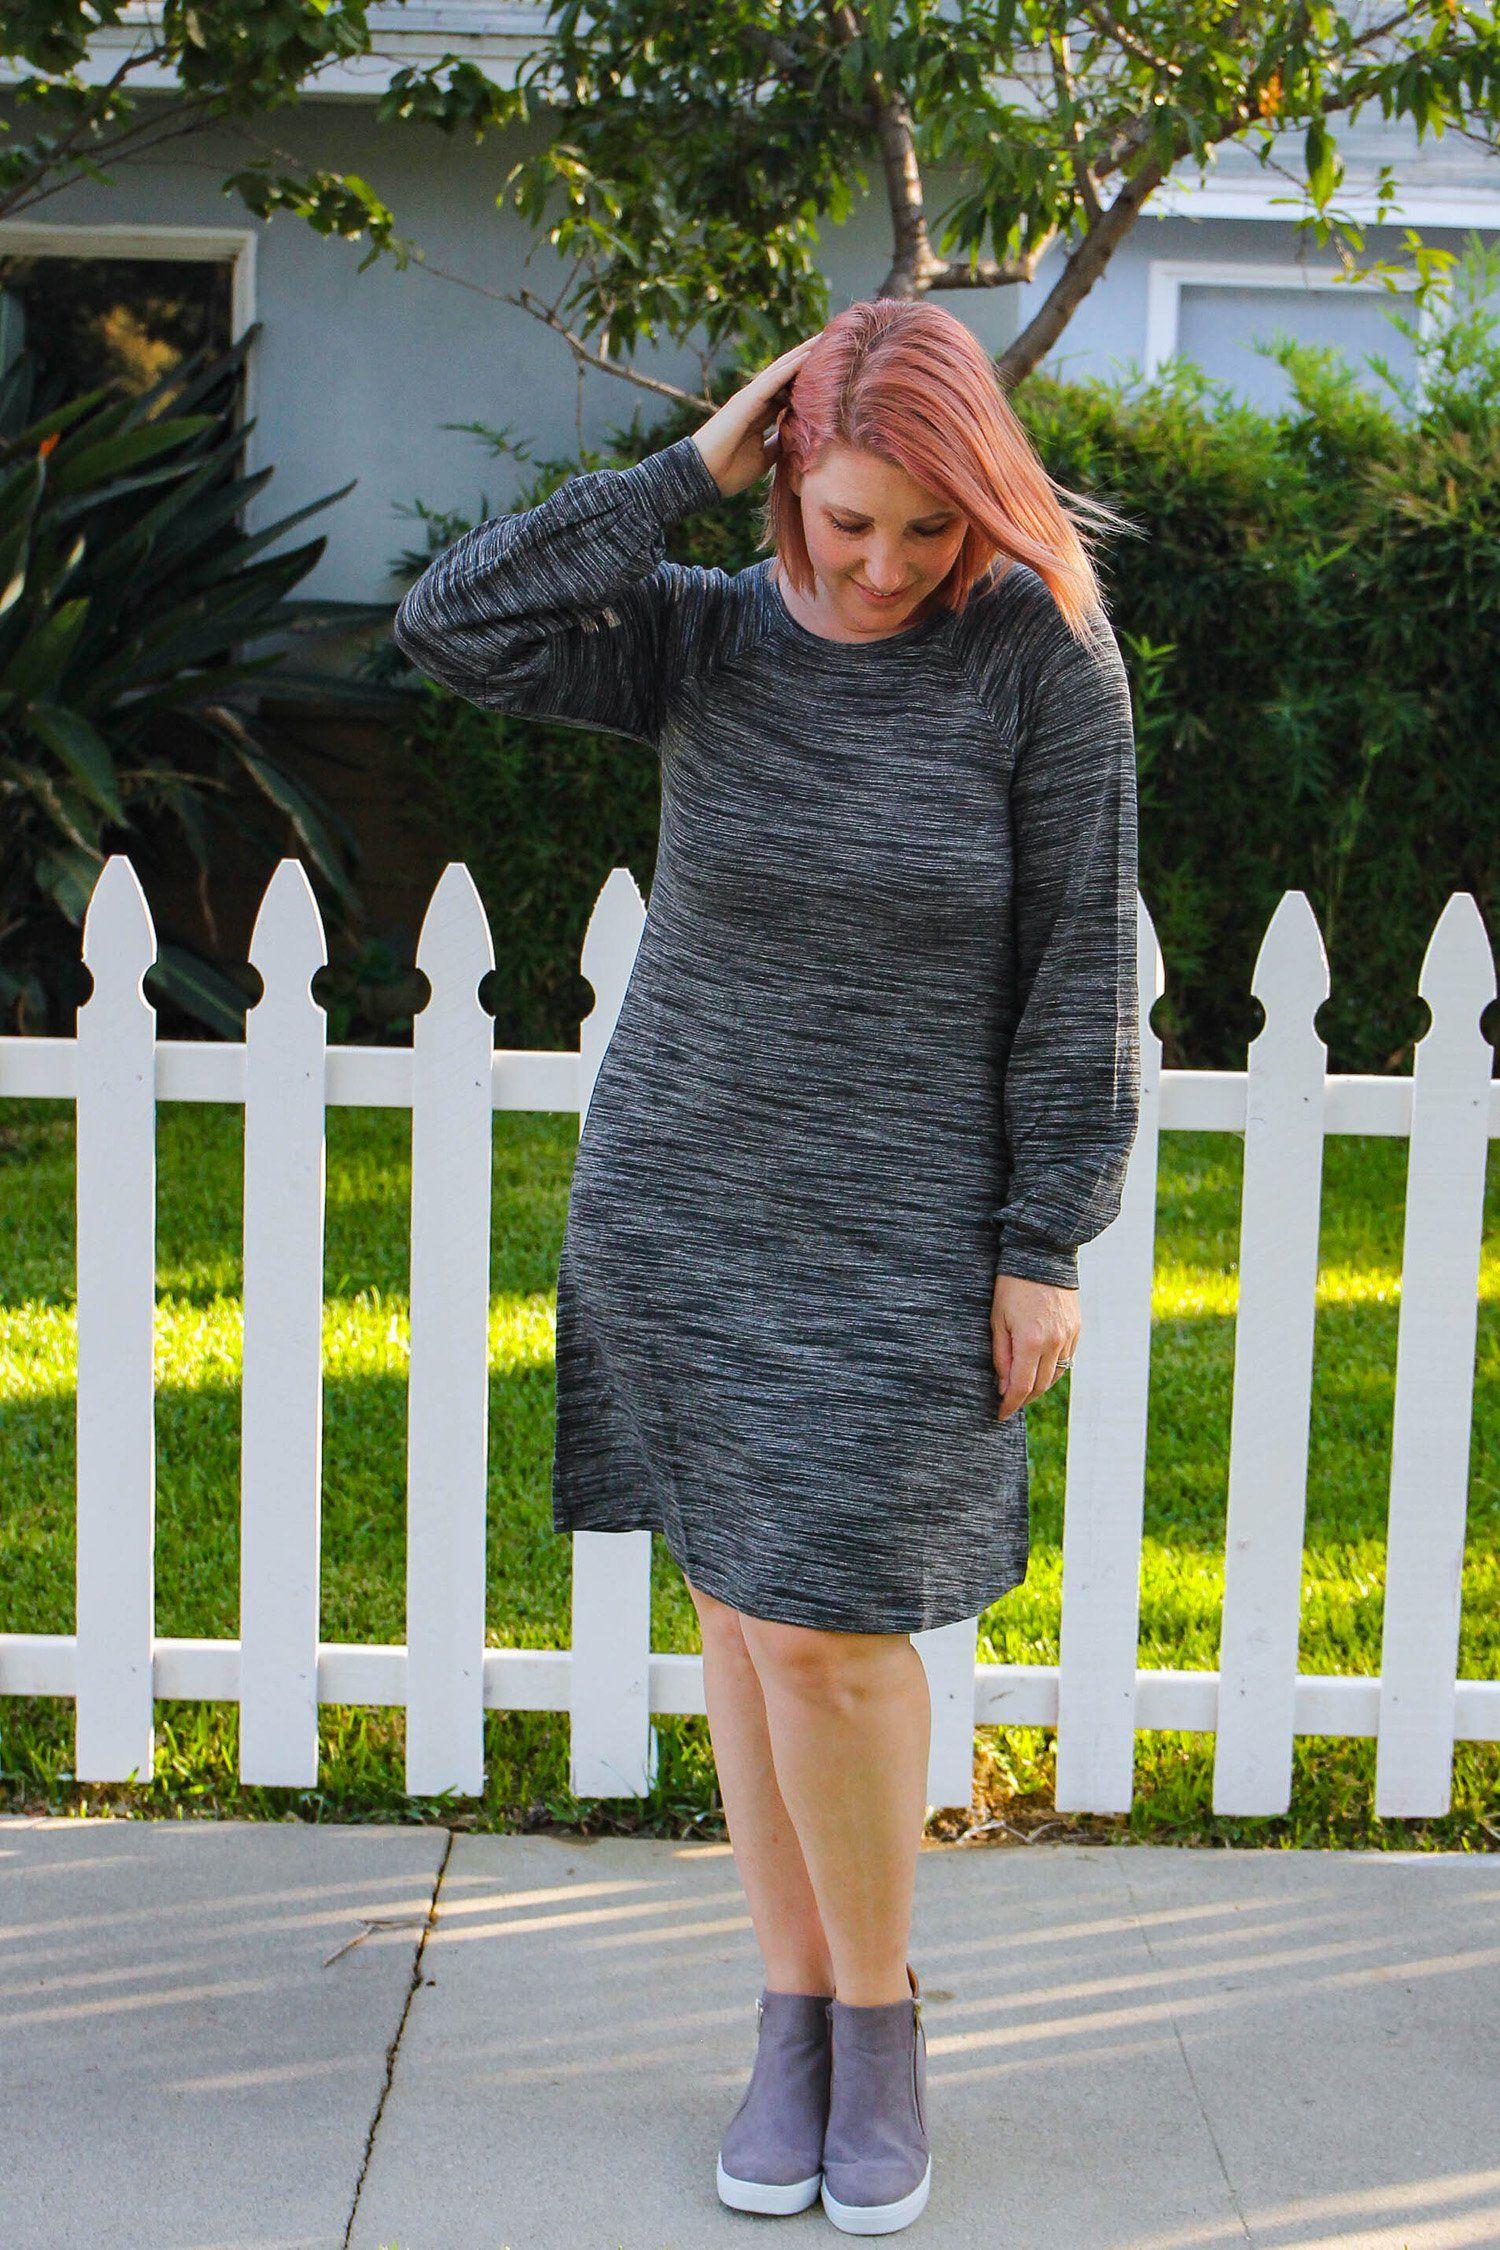 8079e9dcc8df Amazon Prime Wardrobe: October Favorites | Fashion Bloggers ...